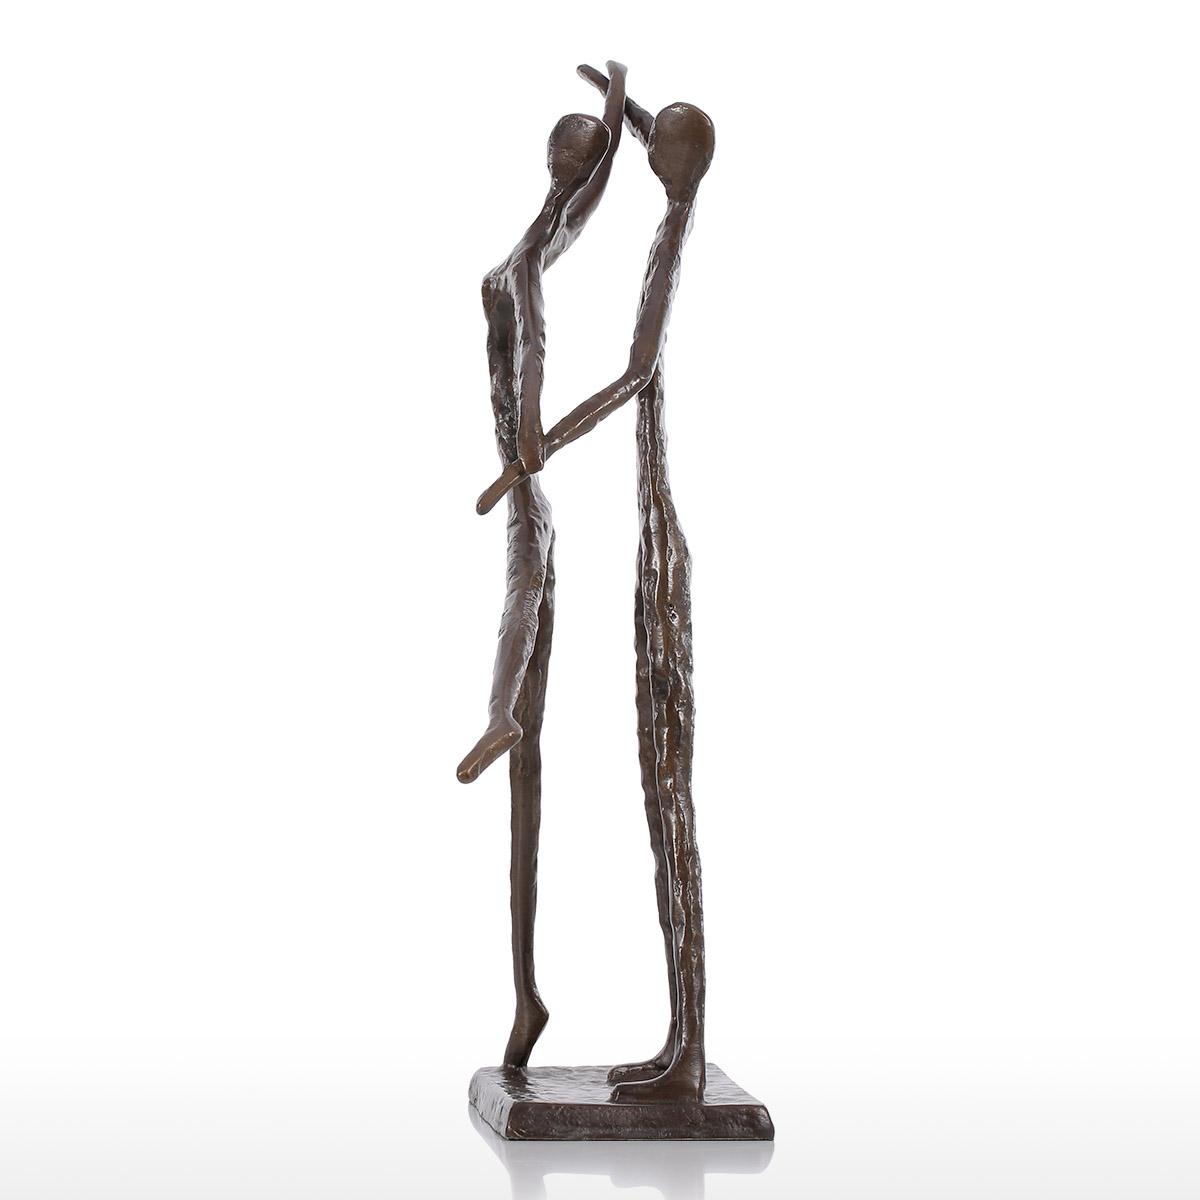 Skulptur Modern ac26 2 1 2948 uuiv jpg